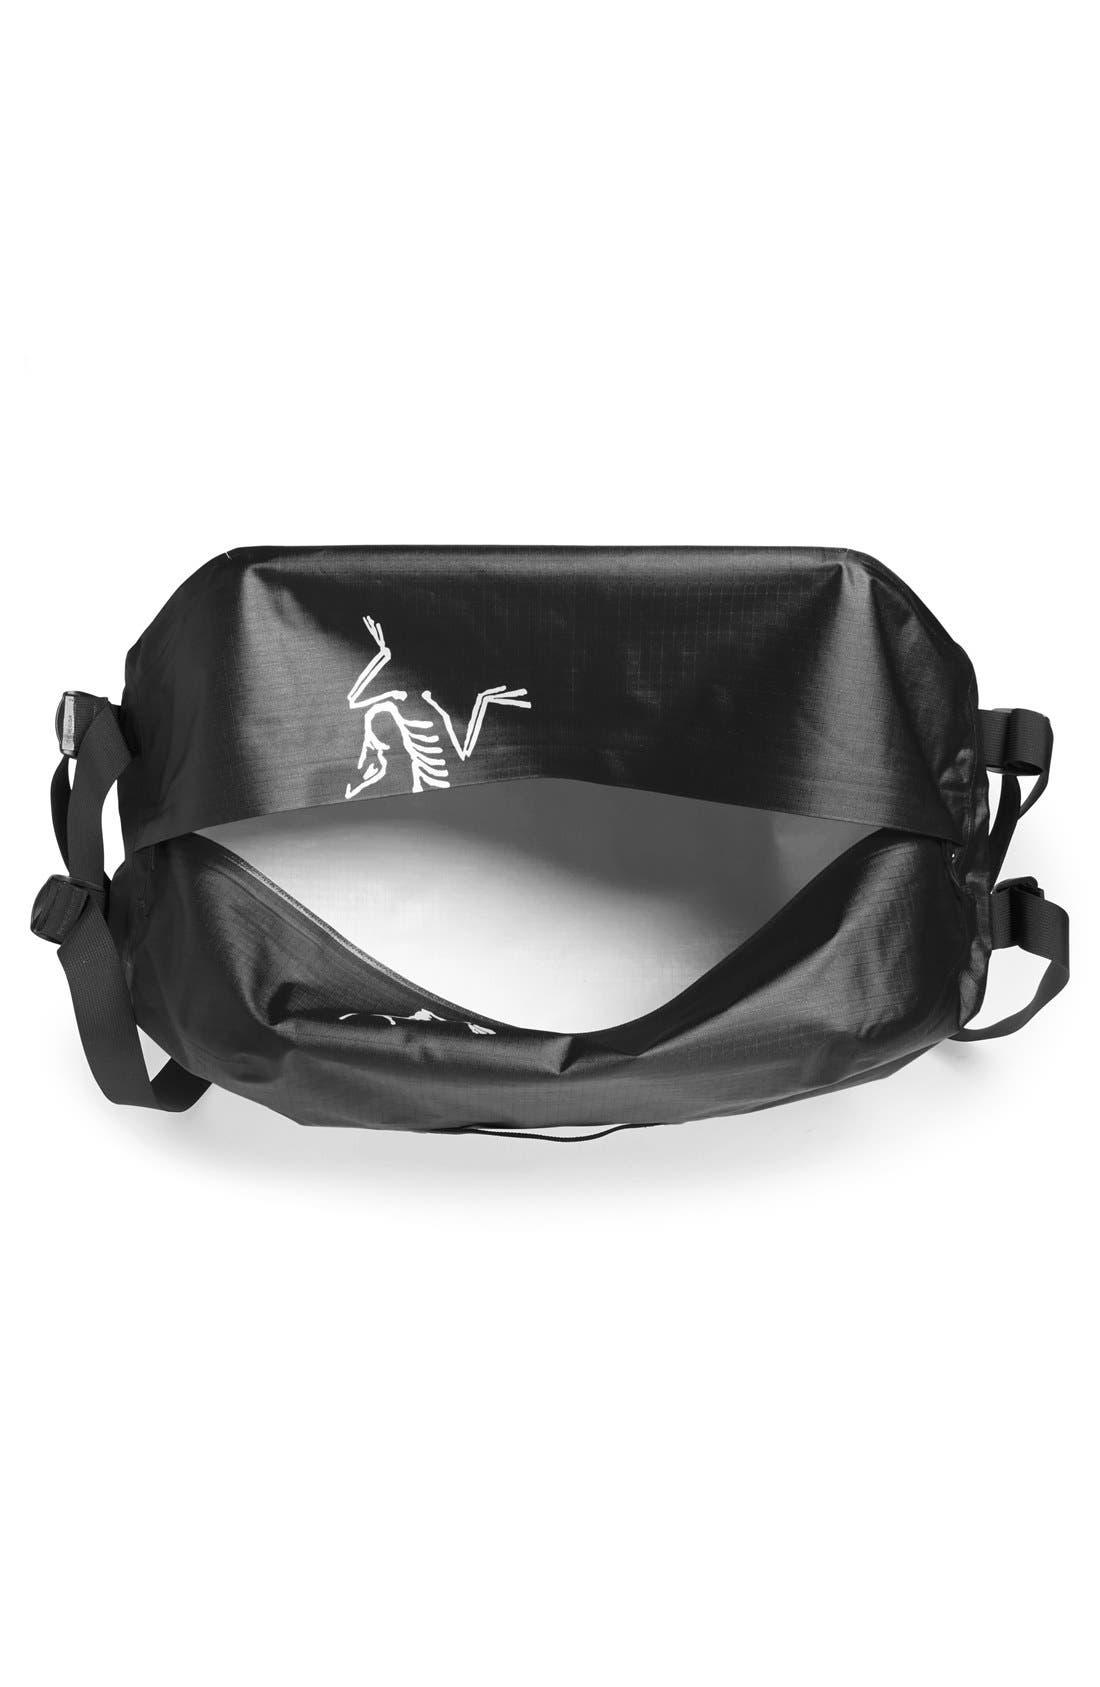 Alternate Image 4  - Arc'teryx 'Carrier' Weather Resistant Convertible Duffel Bag/Backpack (50 liter)